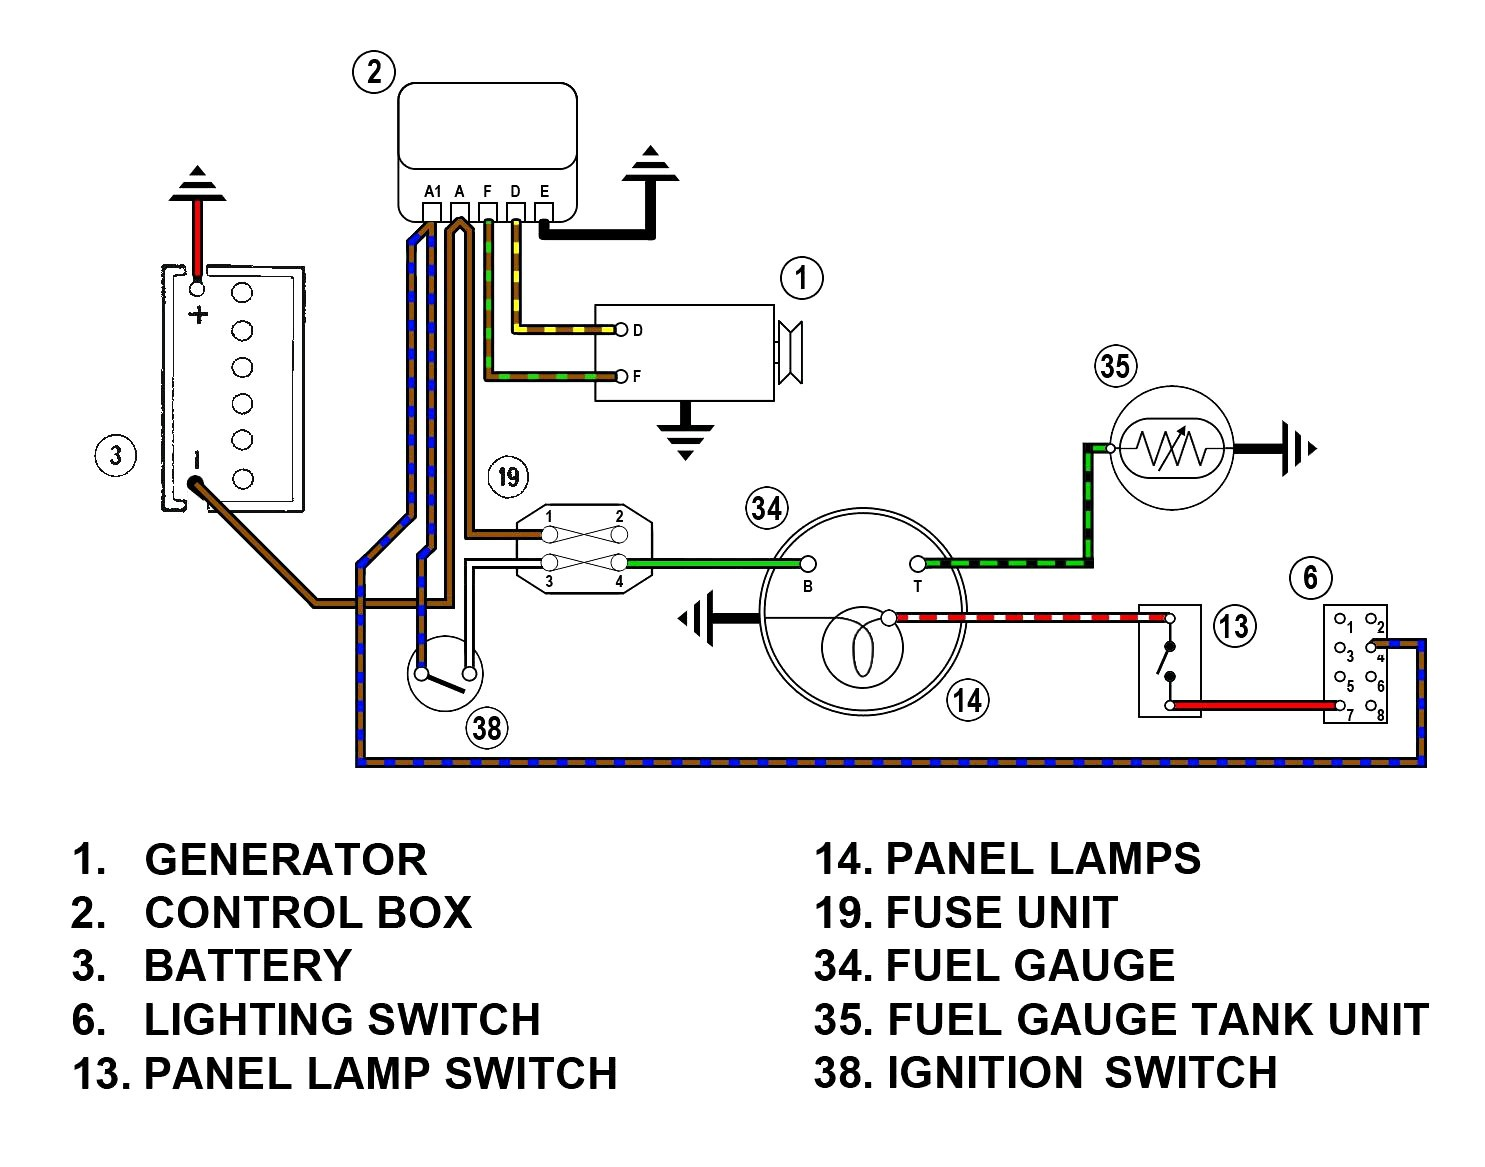 Exelent Travel Trailer Wiring Harness Motif Best for wiring Trailer Wiring Harness Diagram